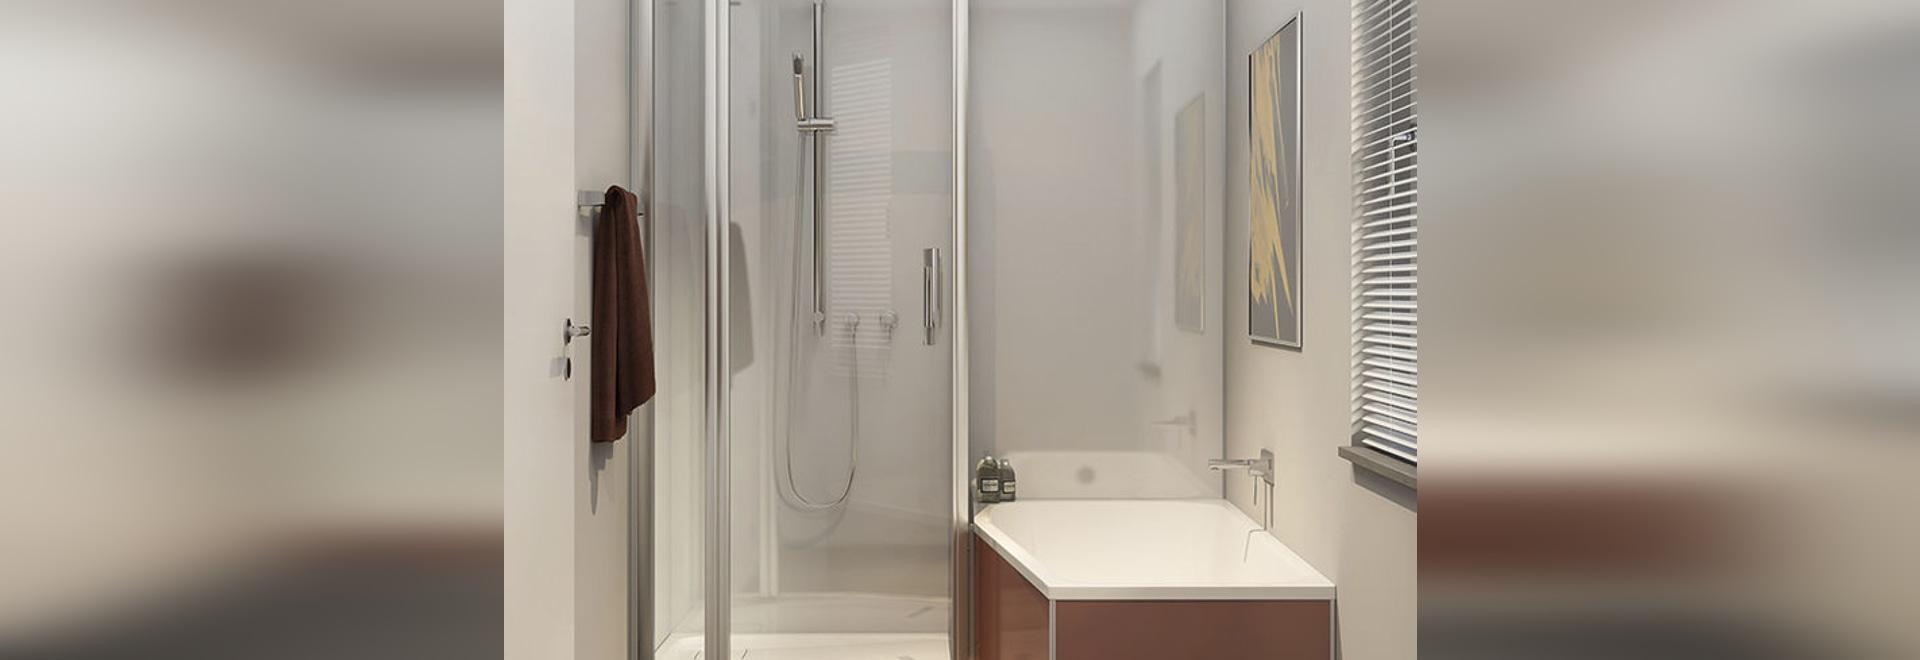 NEW: recessed bathtub-shower combination by DUSCHOLUX AG - DUSCHOLUX AG